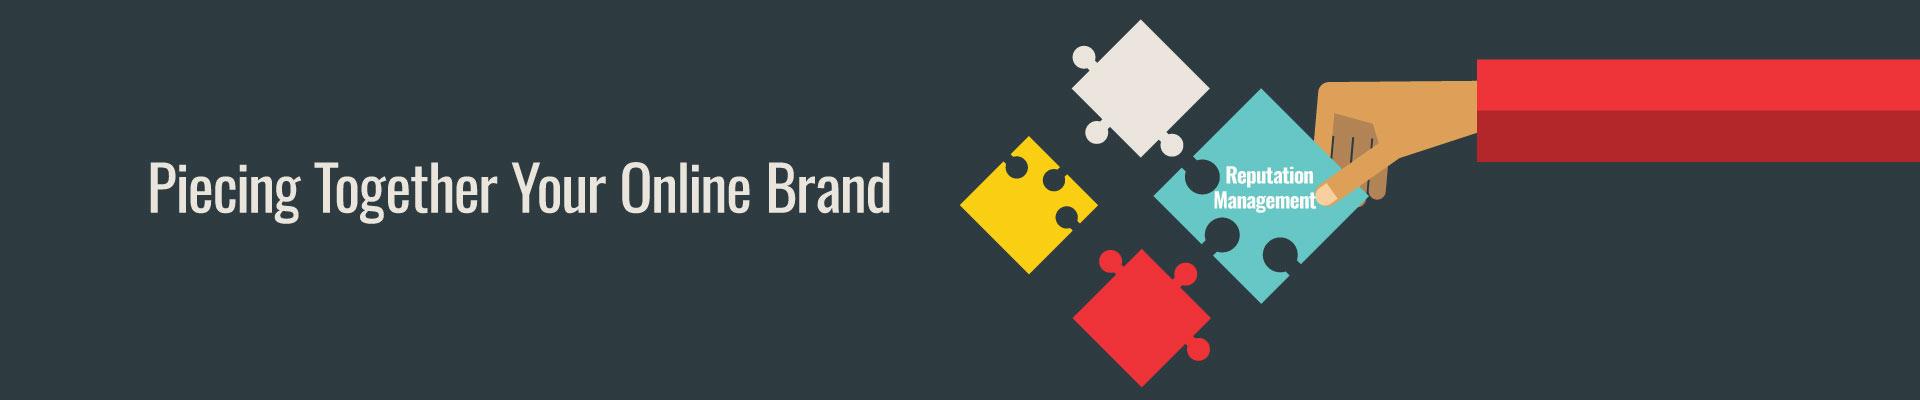 Piecing Together Your Online Brand 2 Orthopreneur Internet Marketing